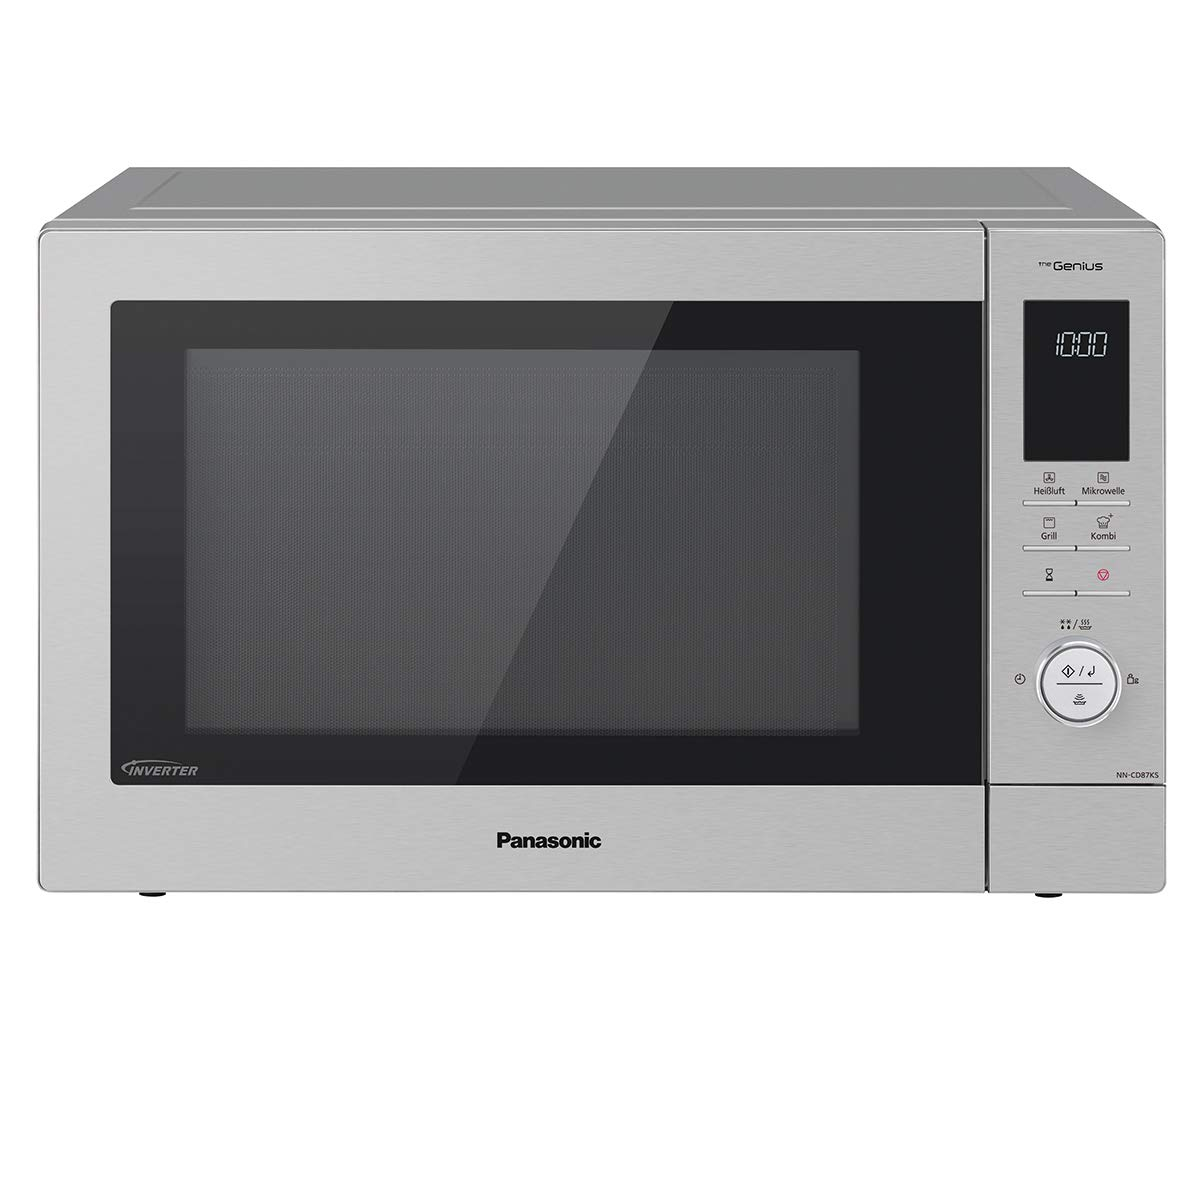 Panasonic NN-CD87 Kombi Mikrowelle (1000 Watt, mit Heißluft und Grill, 34 Liter) edelstahl